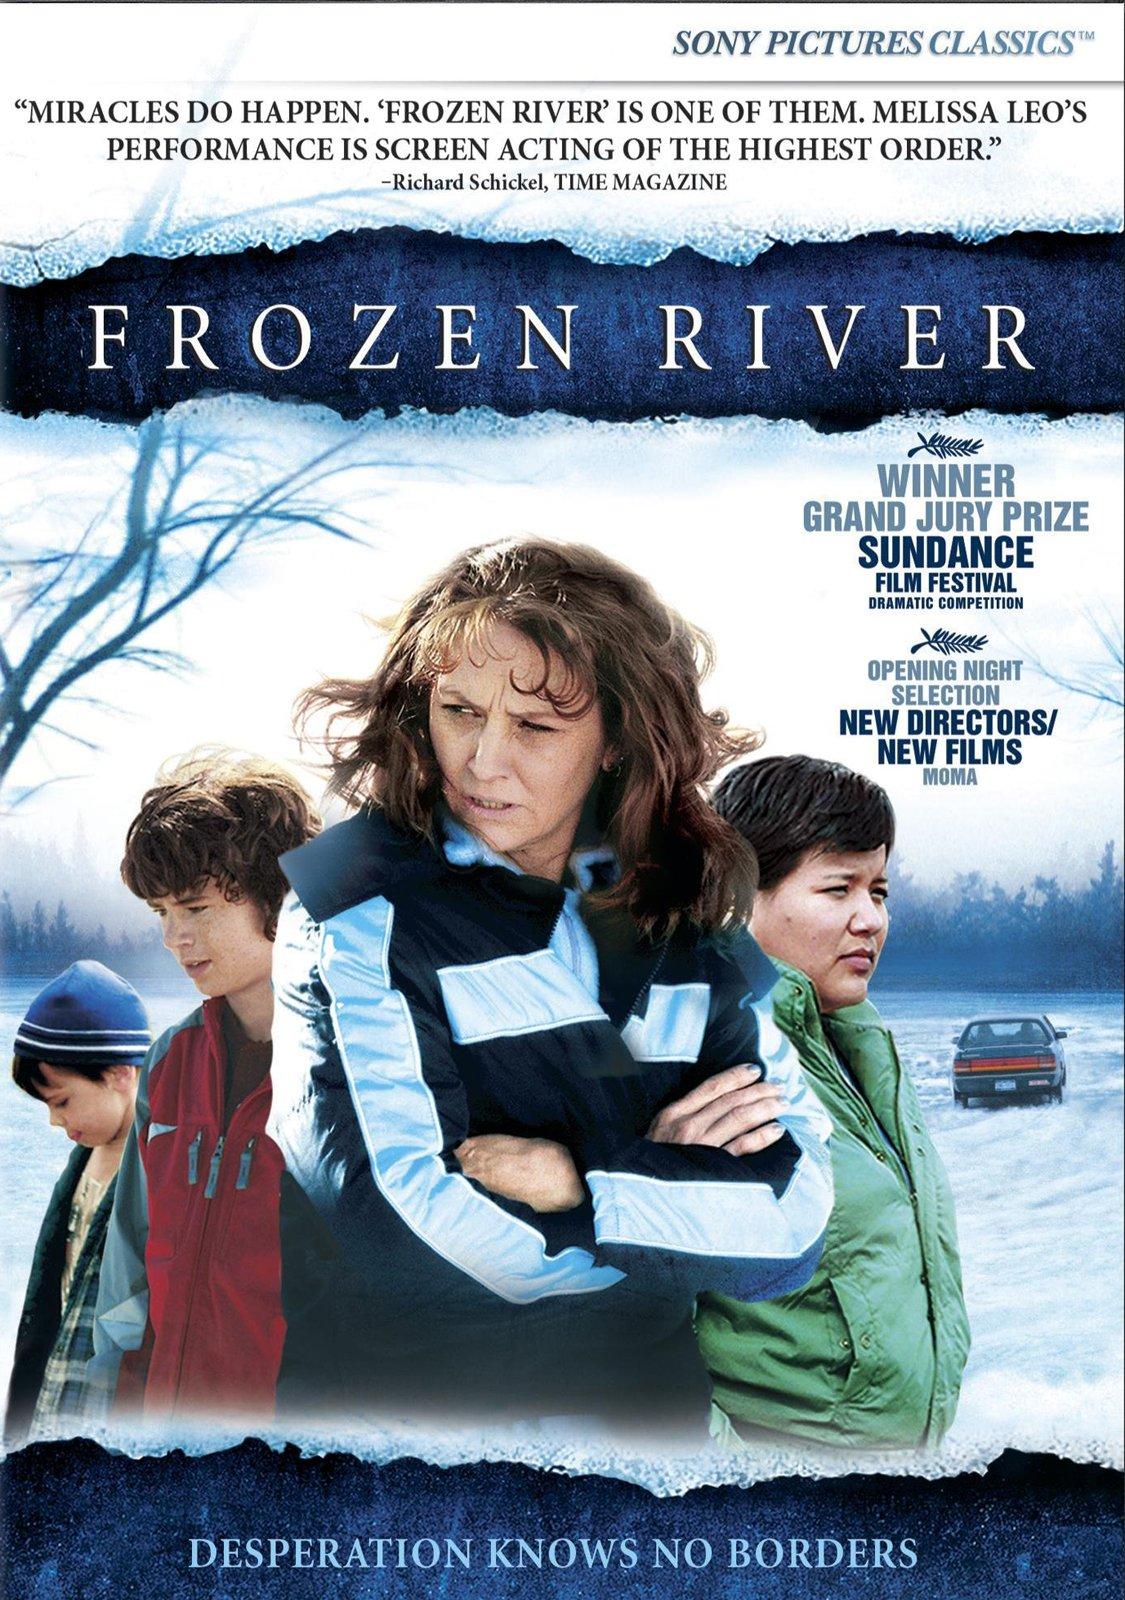 Amazon.com: Frozen River: Lance Delisle, Melissa Leo, Misty Upham, Michael  O'Keefe